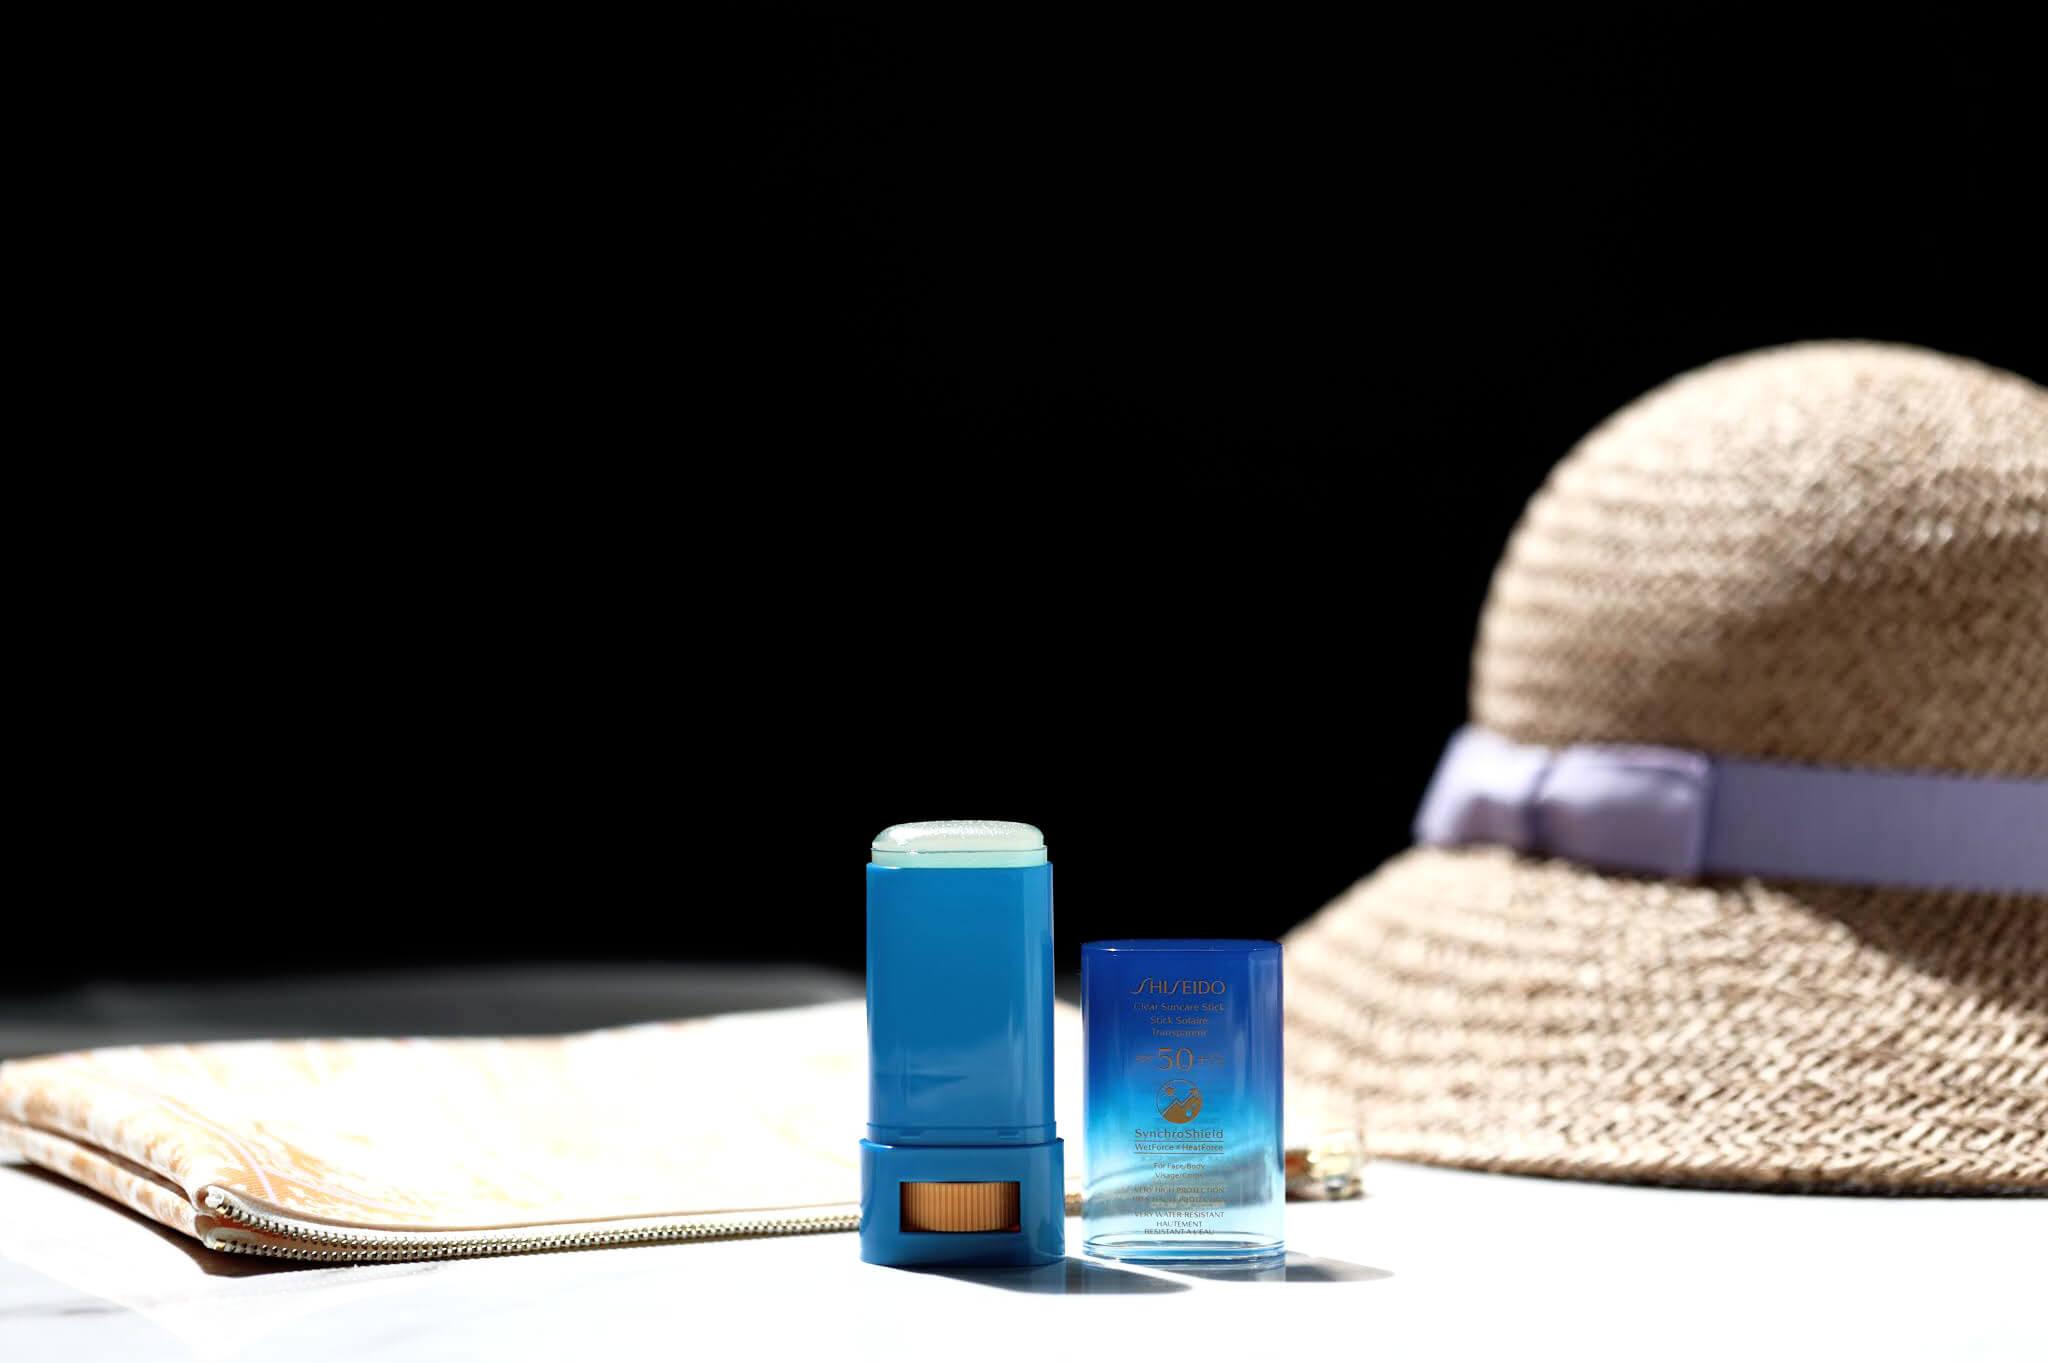 shiseido synchroshield stick solaire wet force